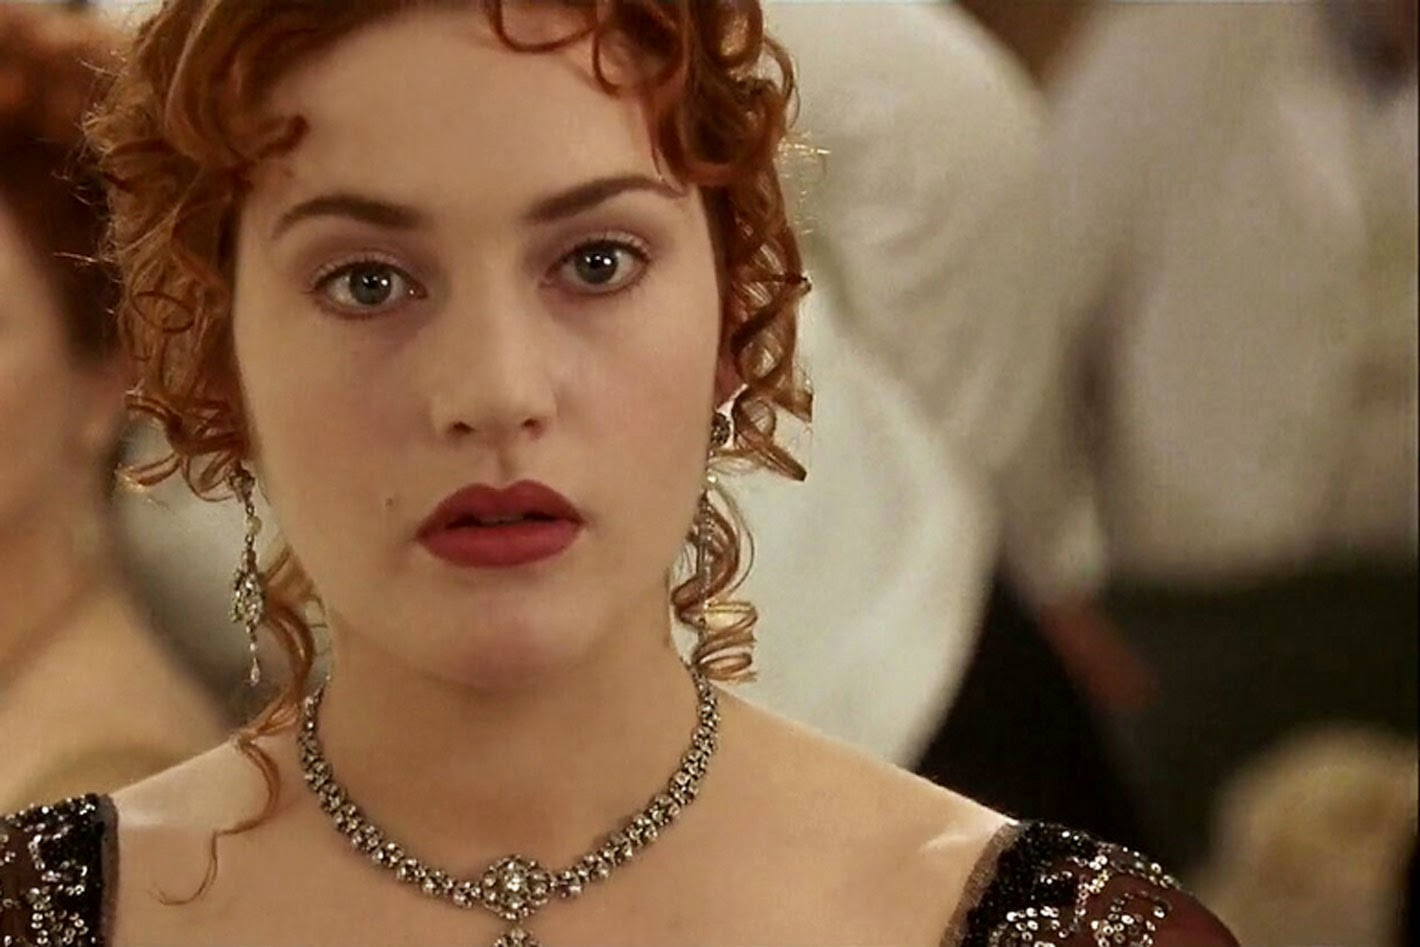 Beautiful Tattoo Girl Wallpaper 22 Kate Winslet Unforgettable Wallpapers Feel Free Love